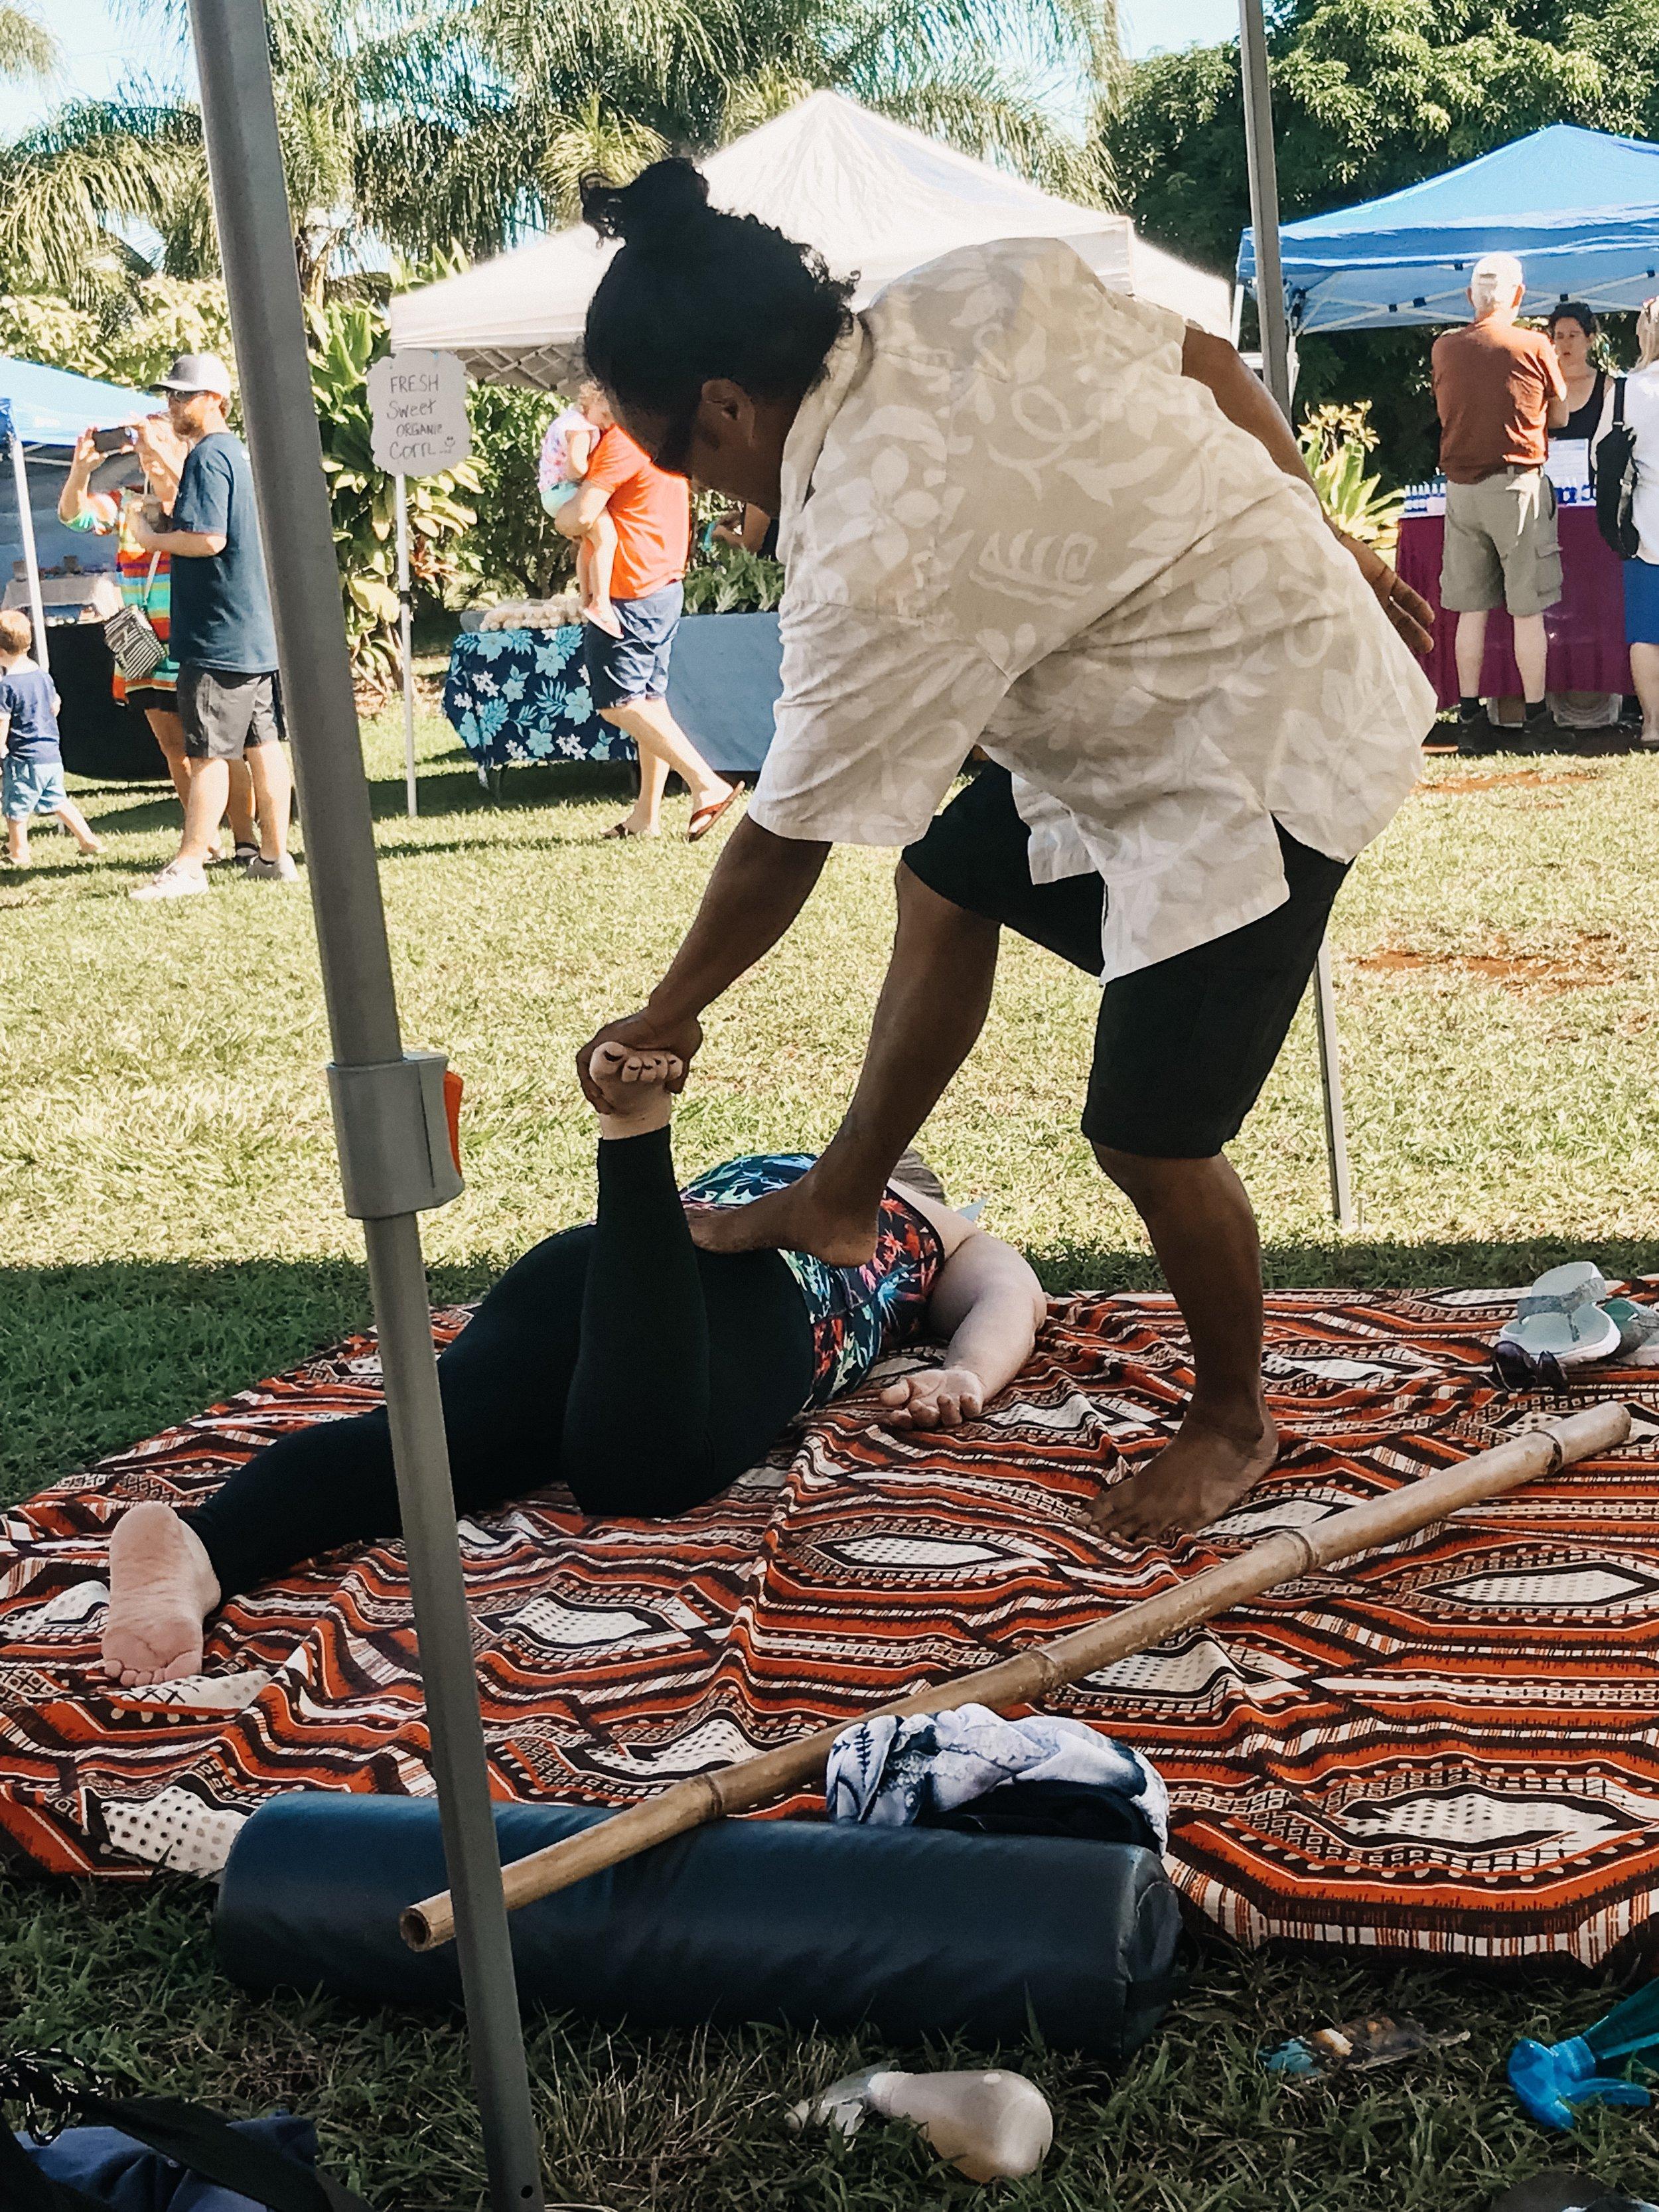 My mom enjoyed a Hawaiian step massage at the market. The cost? A hug!